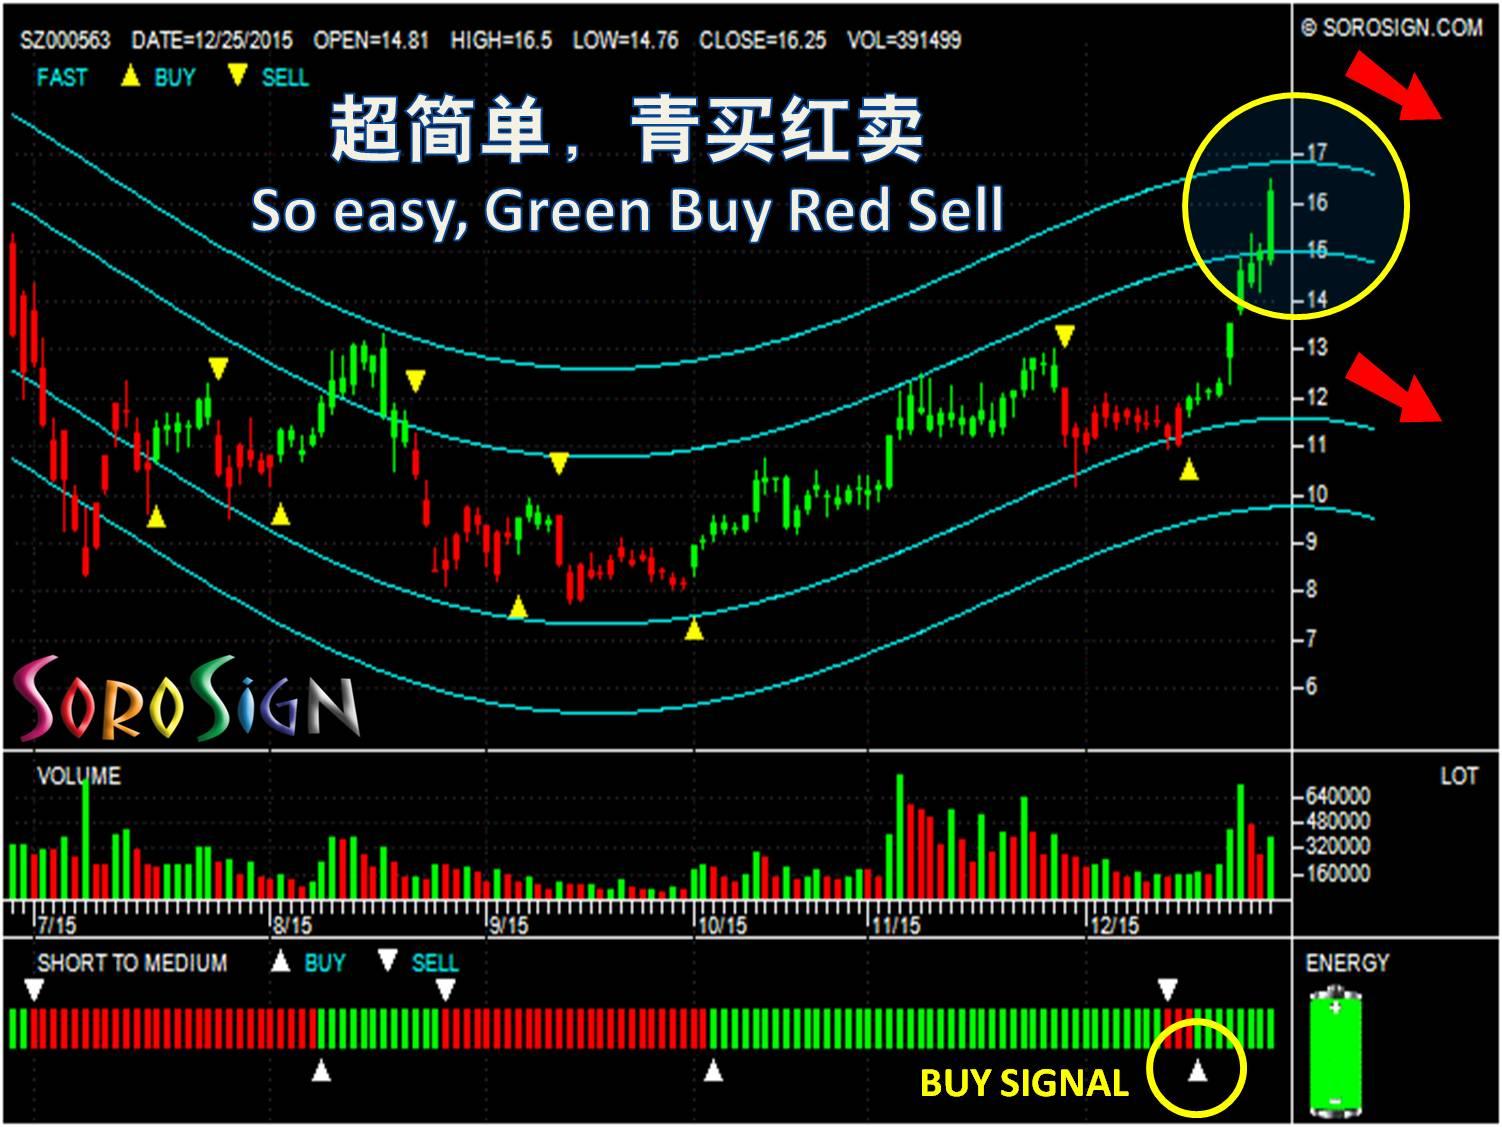 Shenzhen stock Shaanxi International Trust Co Ltd (SZ000563)